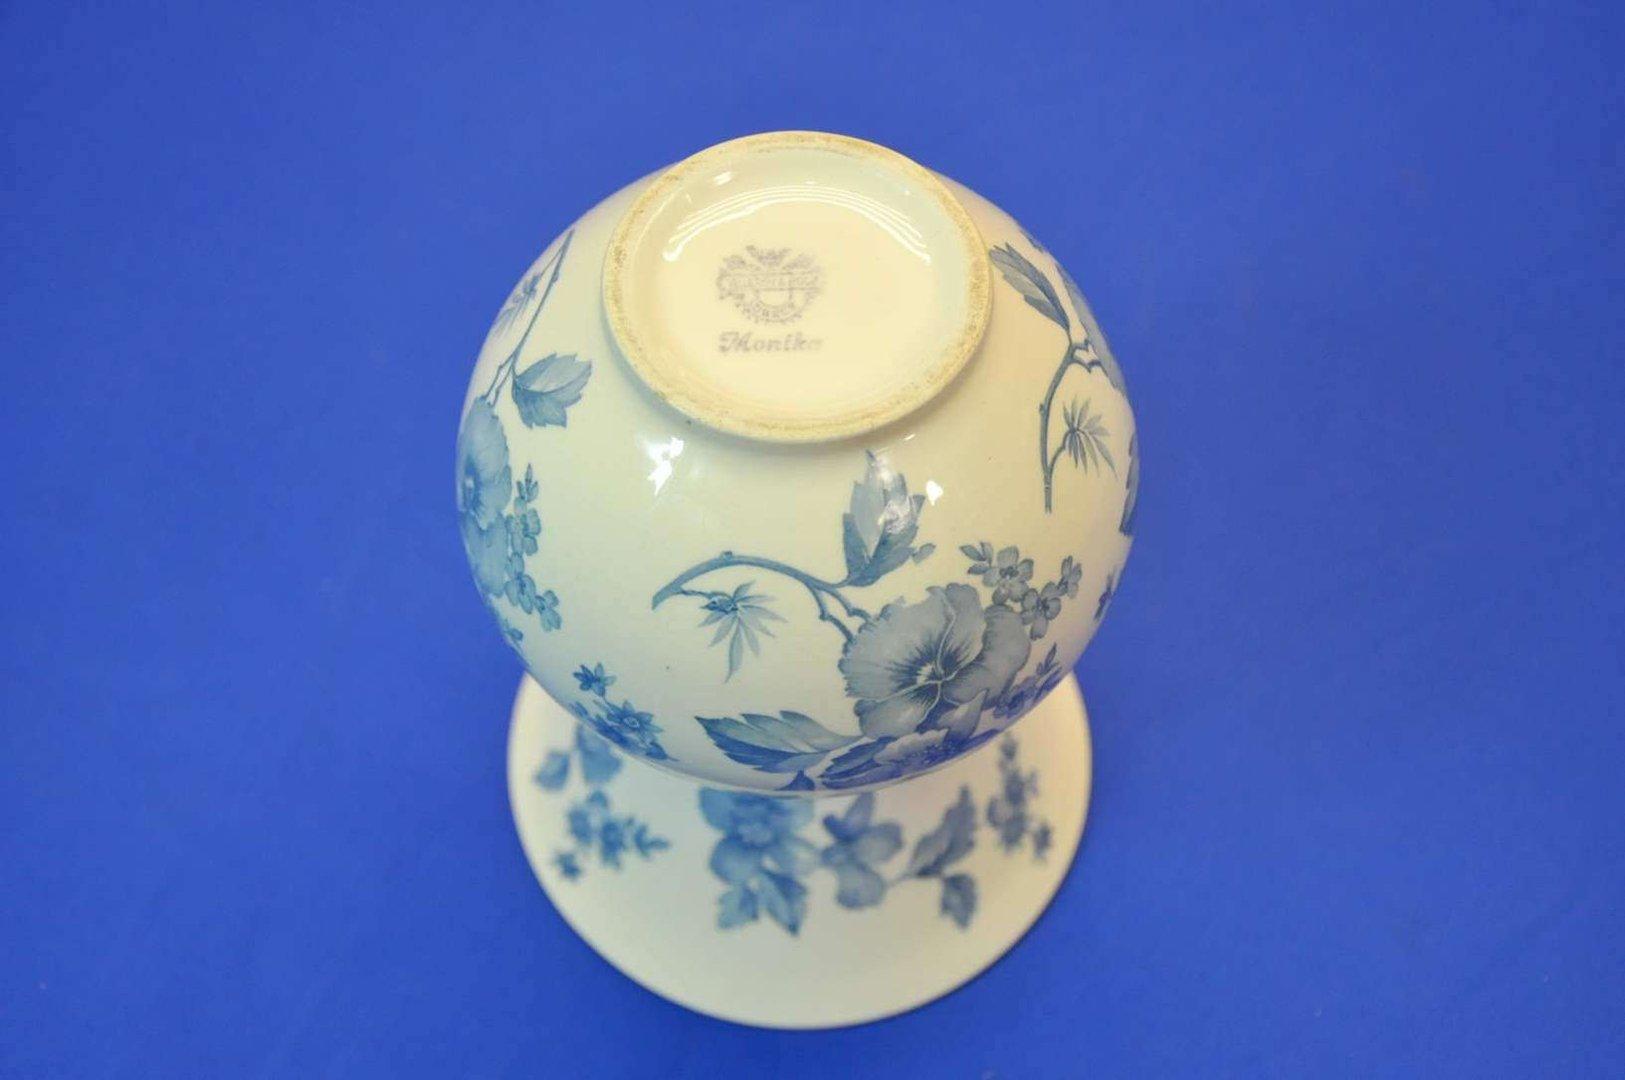 Villeroy boch lbeck ceramic vase monika sale at kusera villeroy boch lbeck ceramic vase monika reviewsmspy